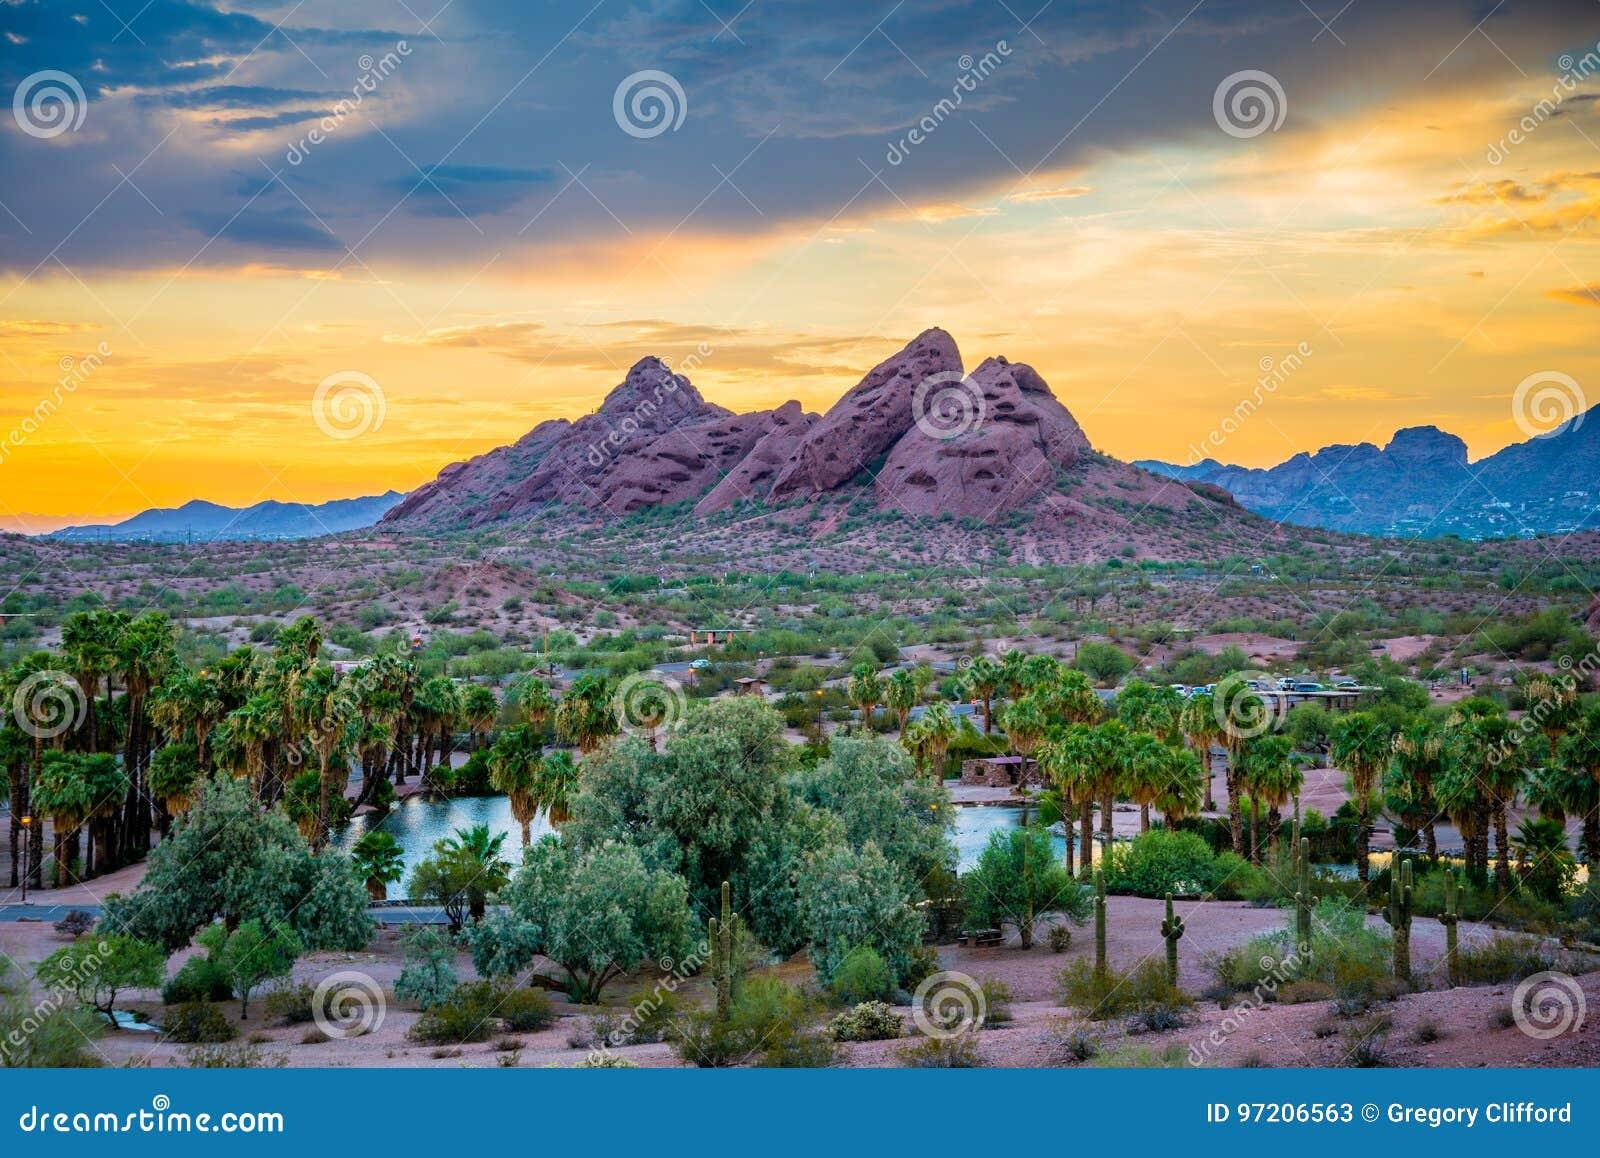 Papago Park at Sunset stock image. Image of background - 97206563